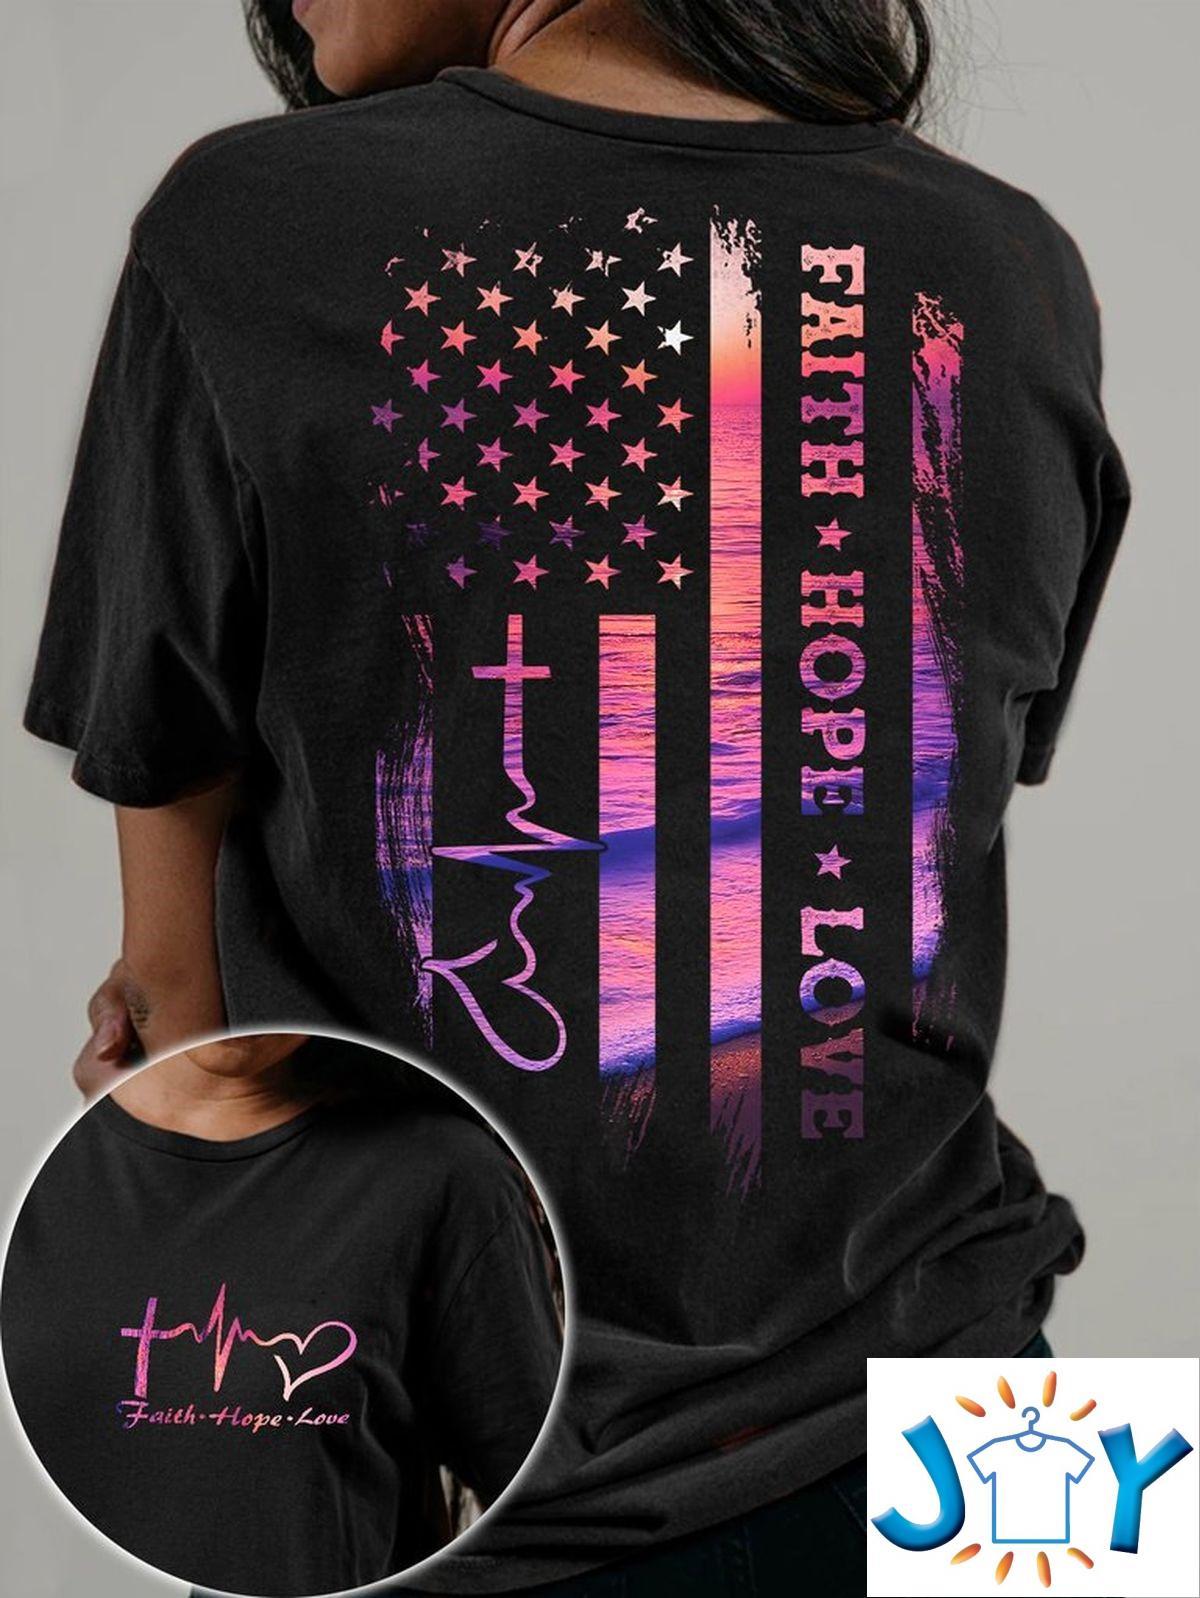 Jesus Faith Hope Love Sunset Beach 3D T-shirt, Hoodie